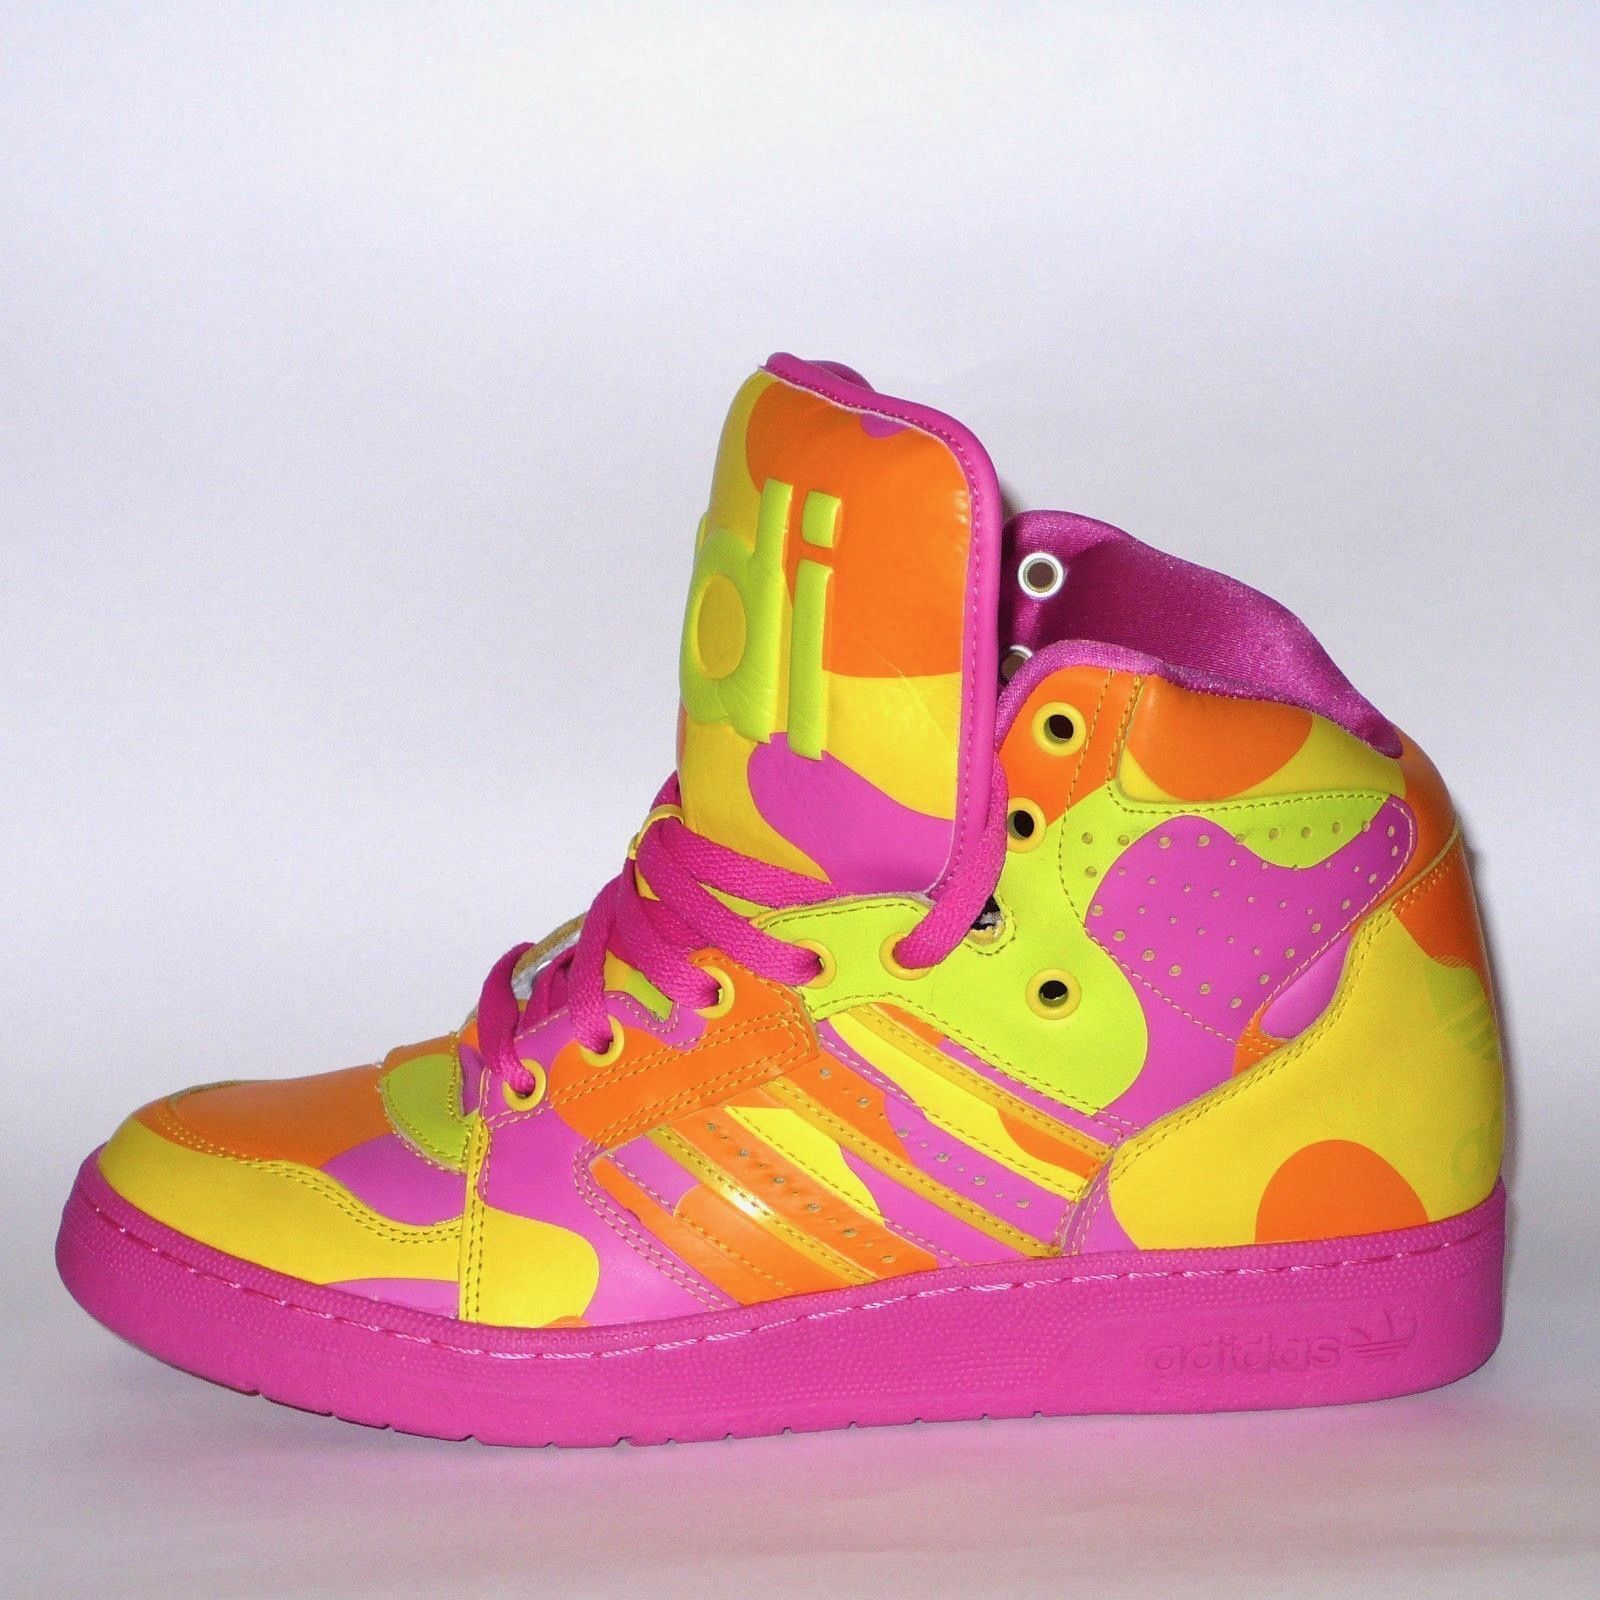 Adidas X EE. Jeremy Scott Neon UU. Camo instinto Zapatos EE. X UU. Neon 9 4bc789